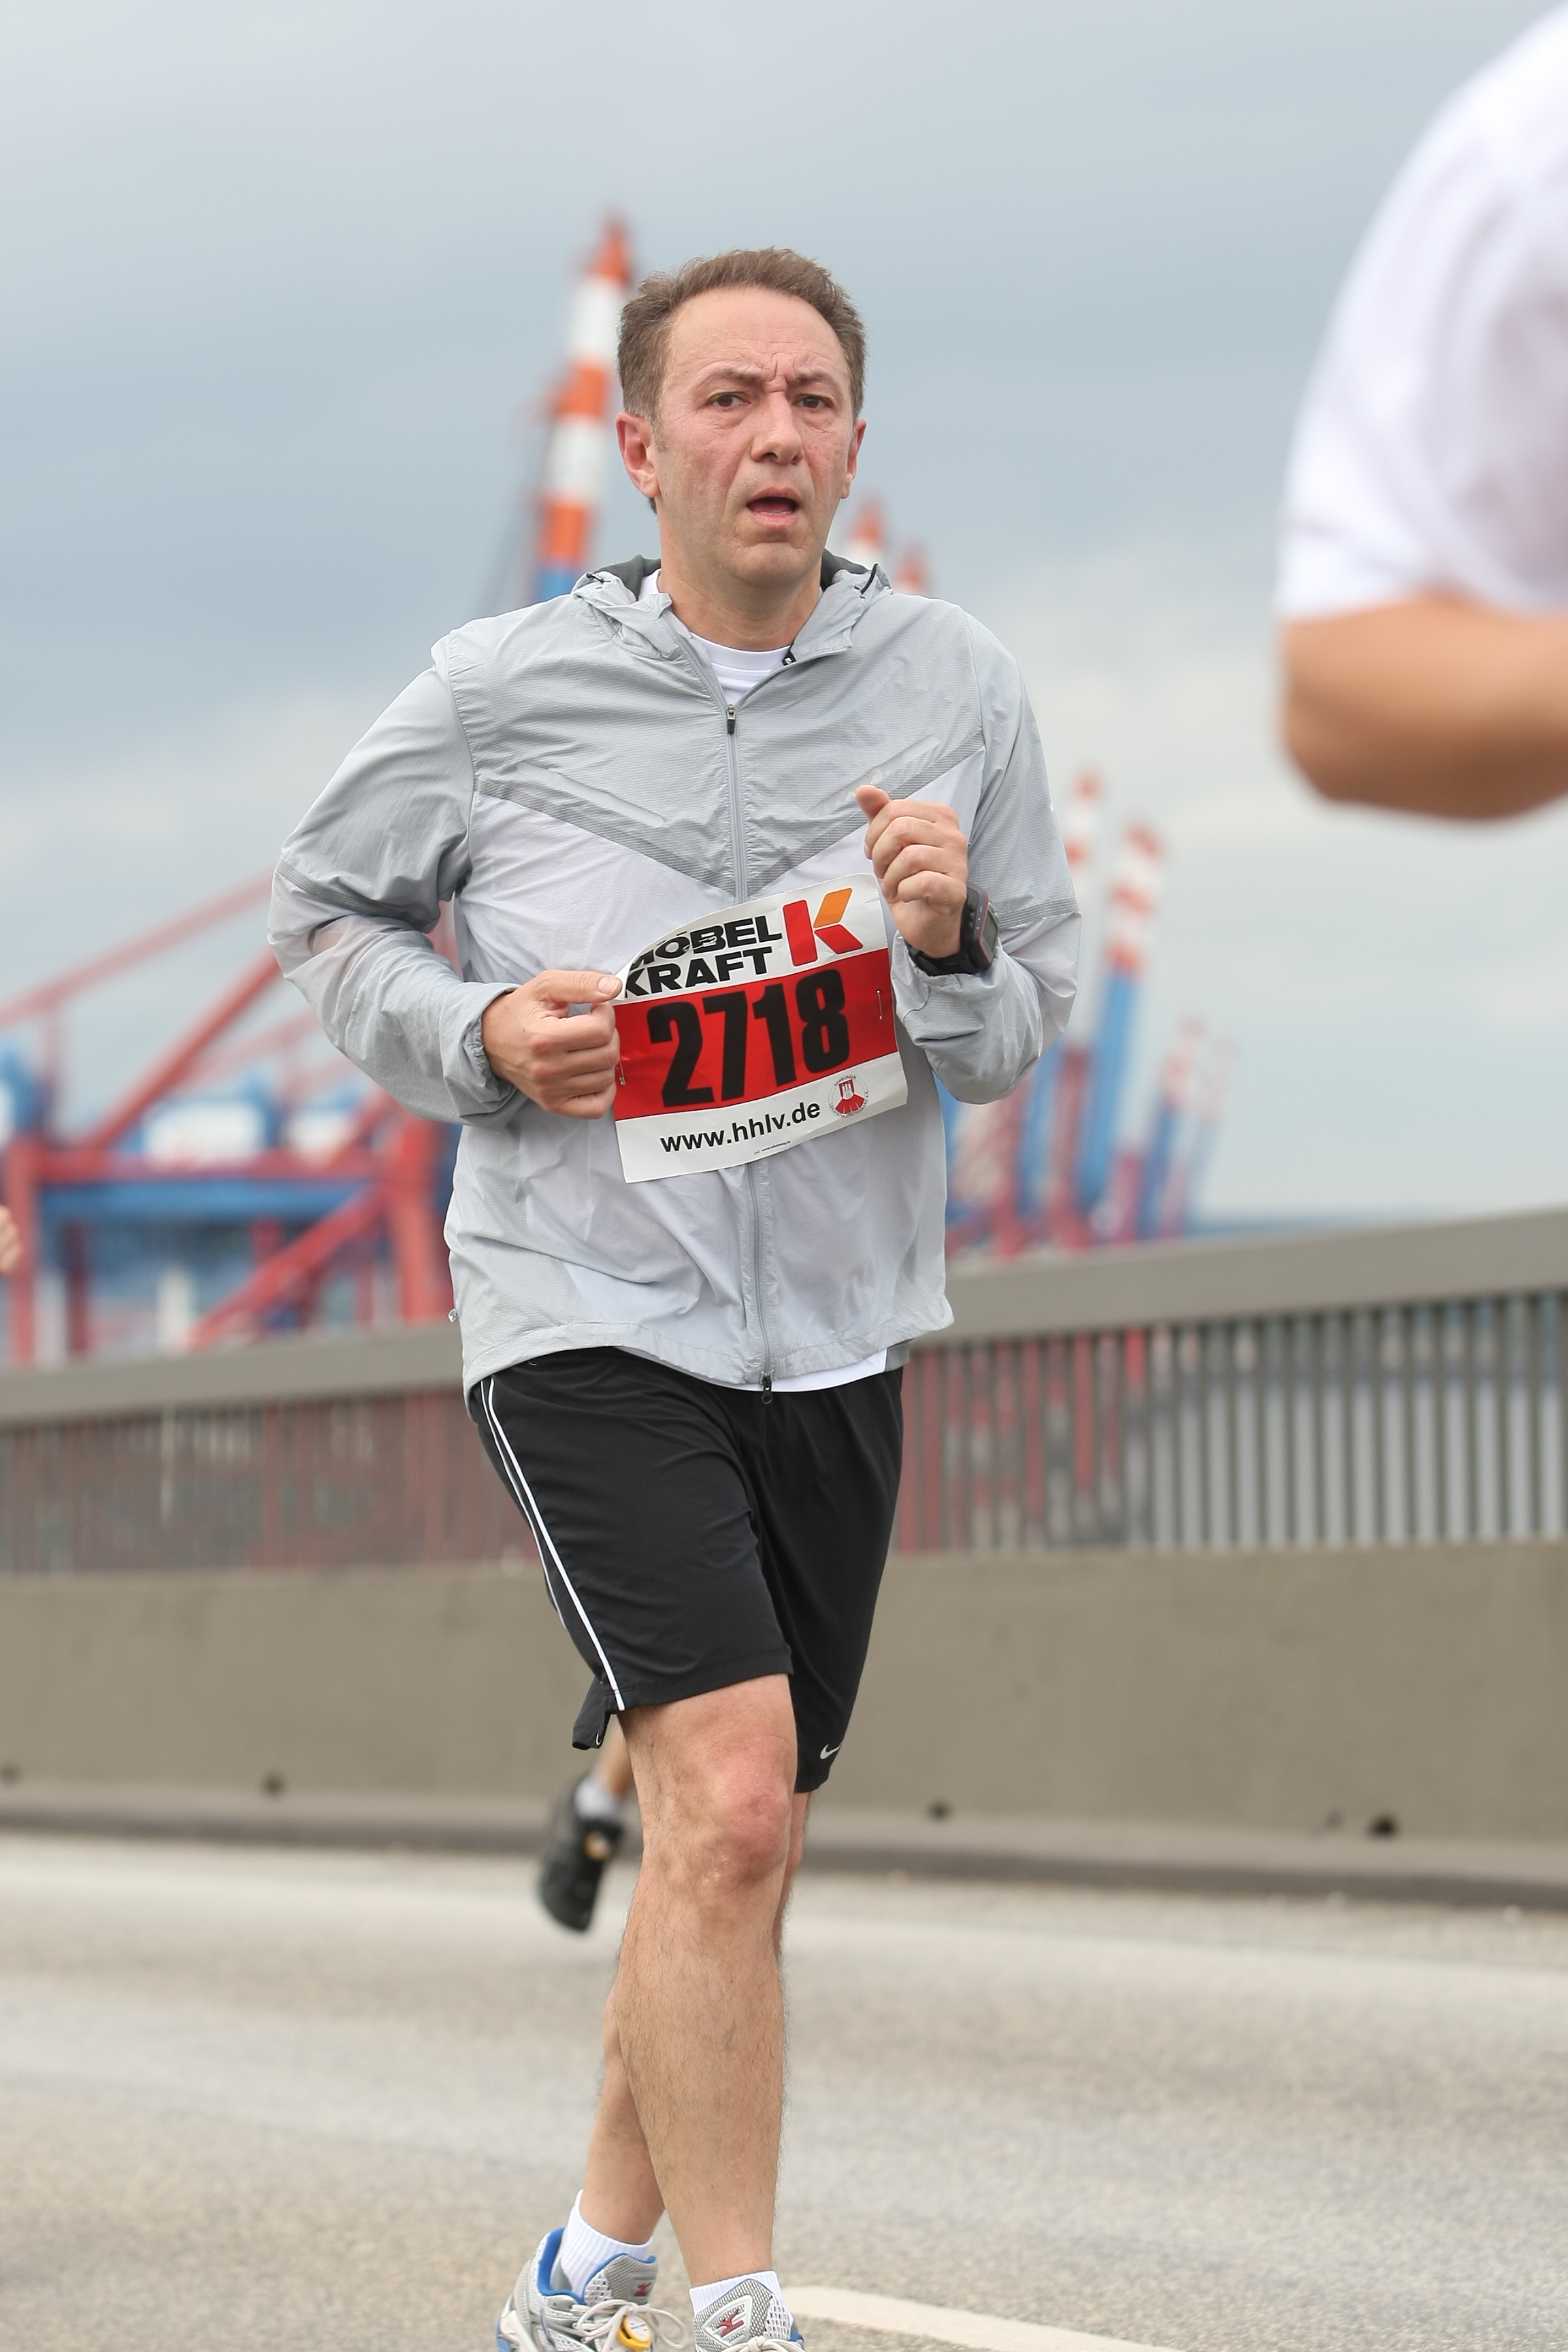 Farid joggt auf der Köhlbrandtbrücke